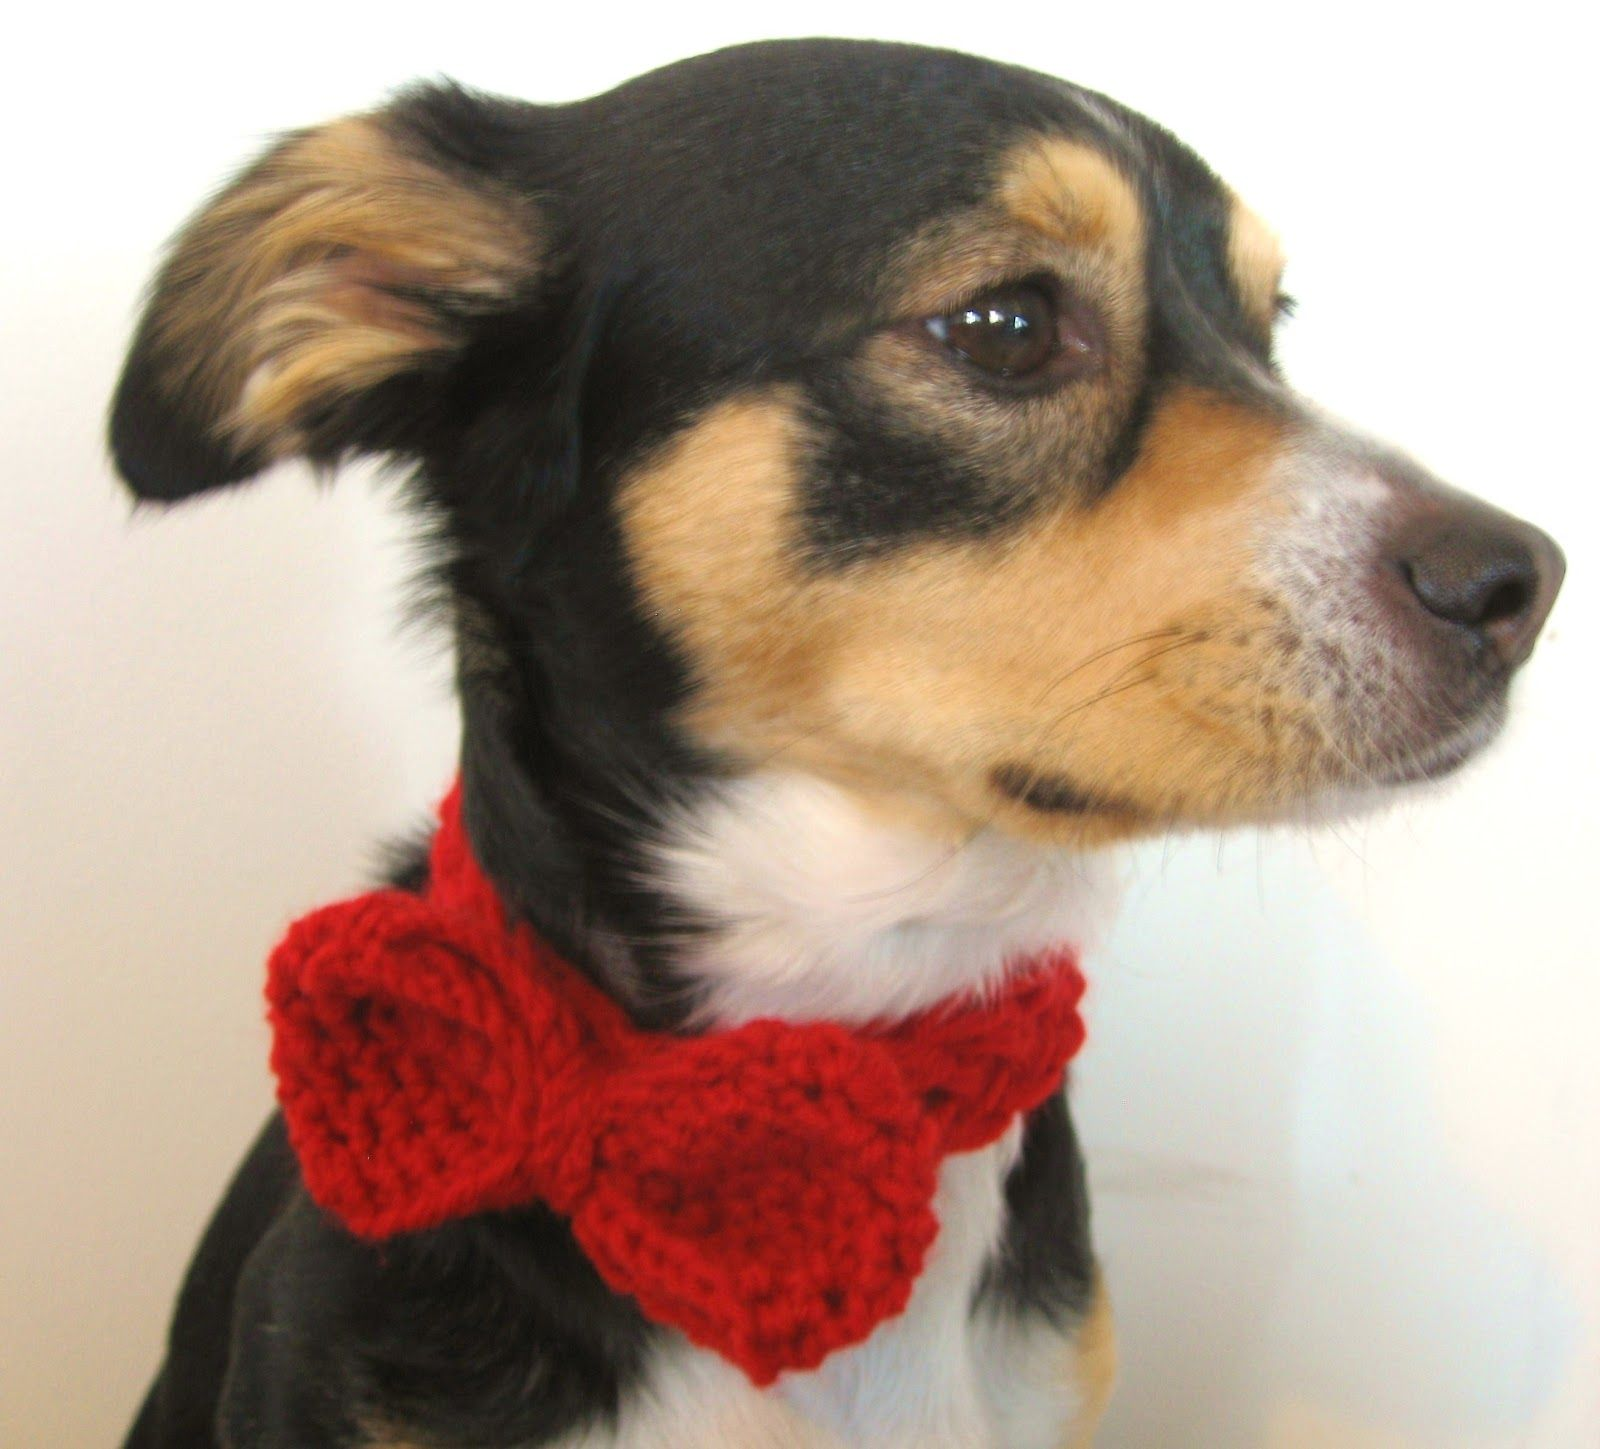 Dogscrochet megan e sass handknits free pattern crochet dog dogscrochet megan e sass handknits free pattern crochet dog bow tie bankloansurffo Image collections